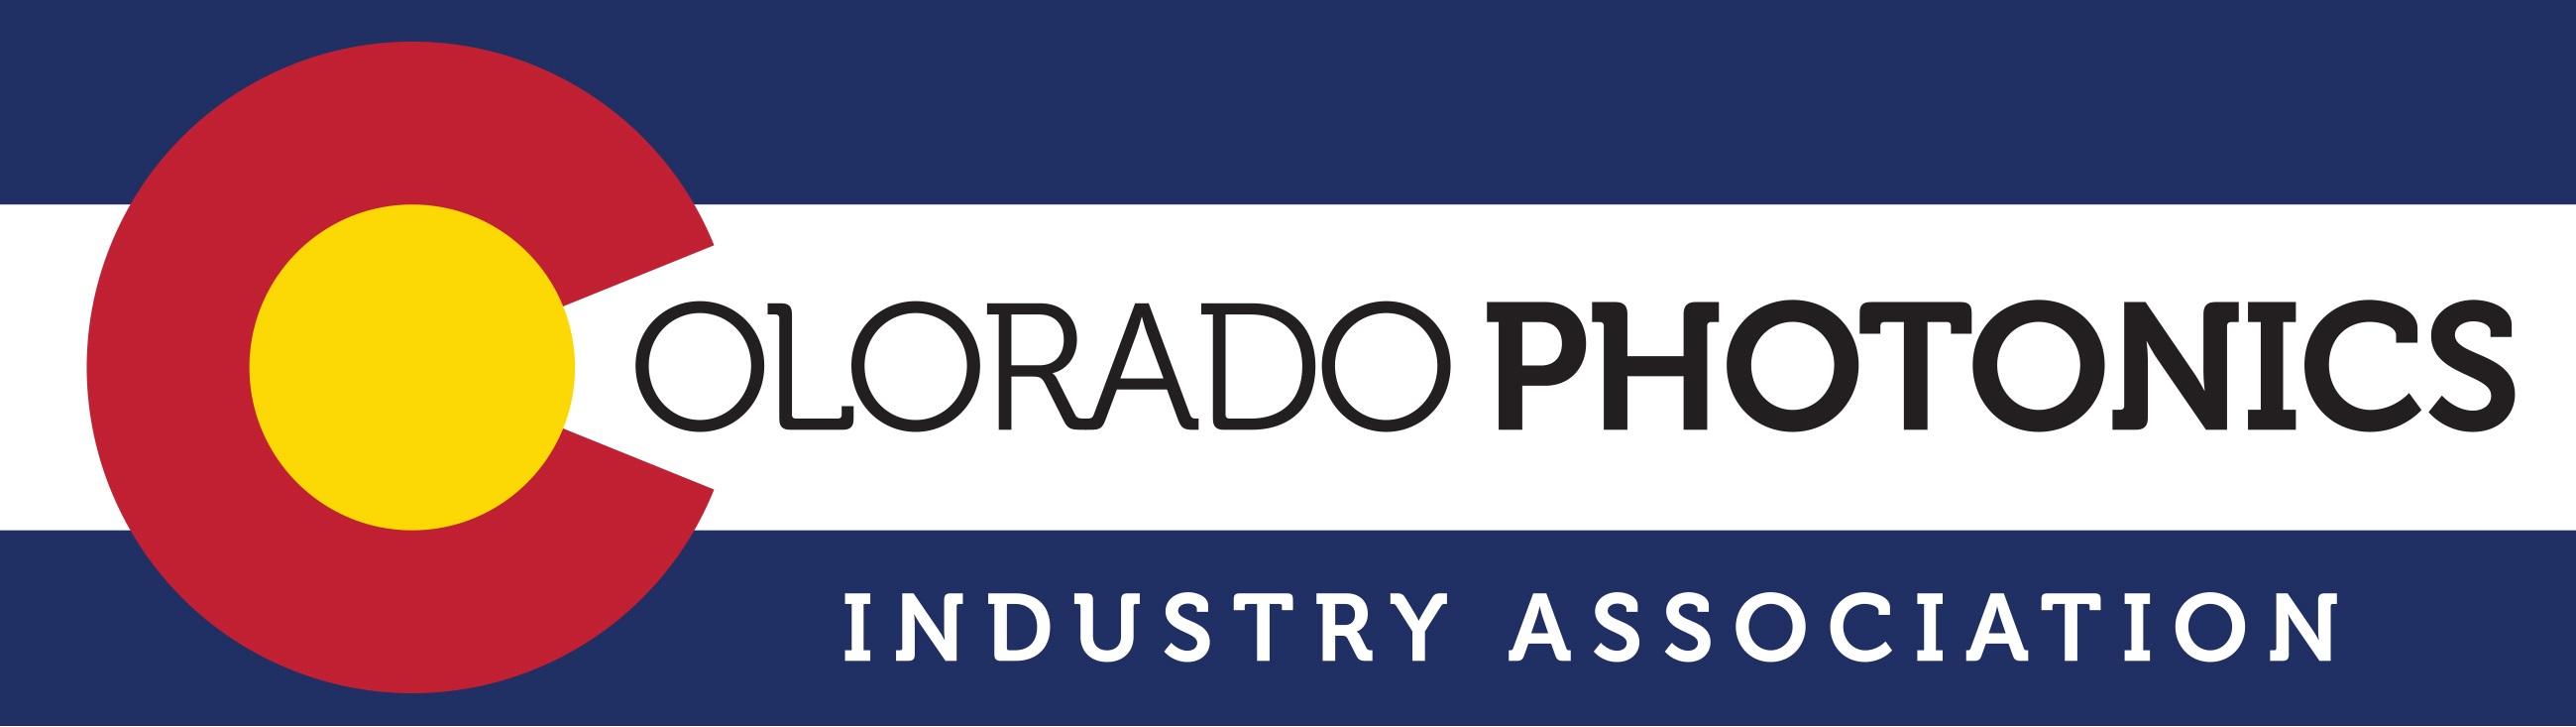 Colorado Photonics Industry Association